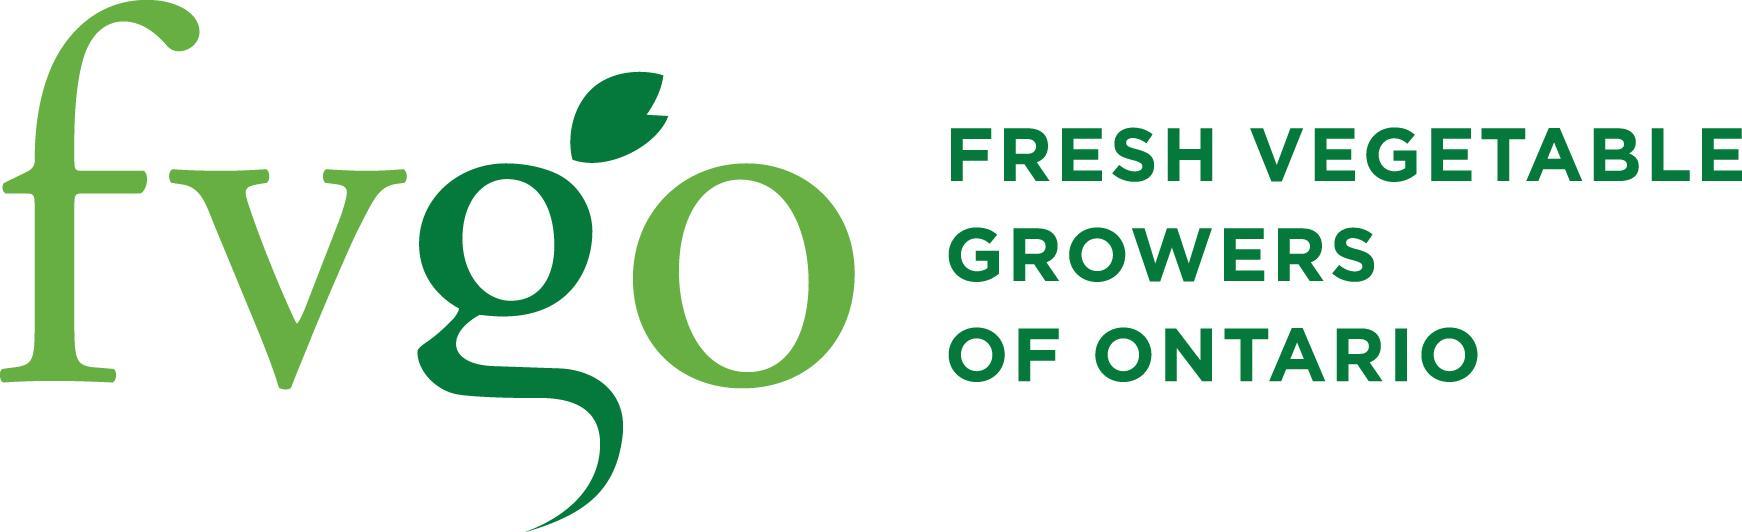 Fresh vegetable growers of Ontario logo